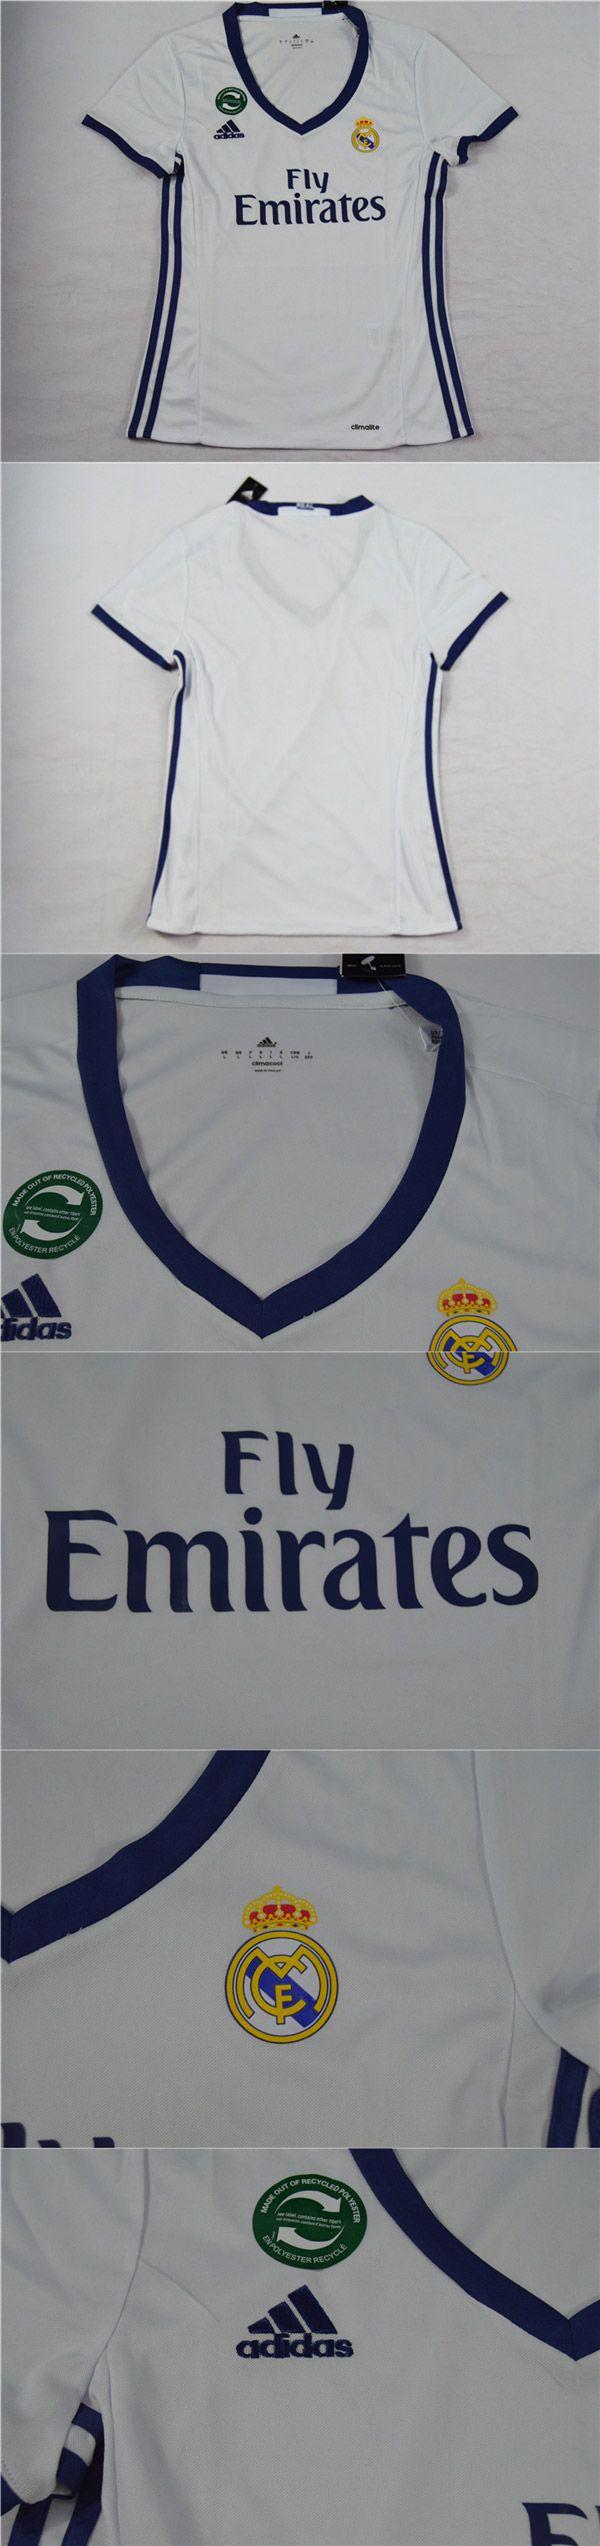 Cheap Soccer Jerseys   Spanish Liga Real Madrid Home Women's Jersey Shirt 2016-2017   www.hotclubjersey.com